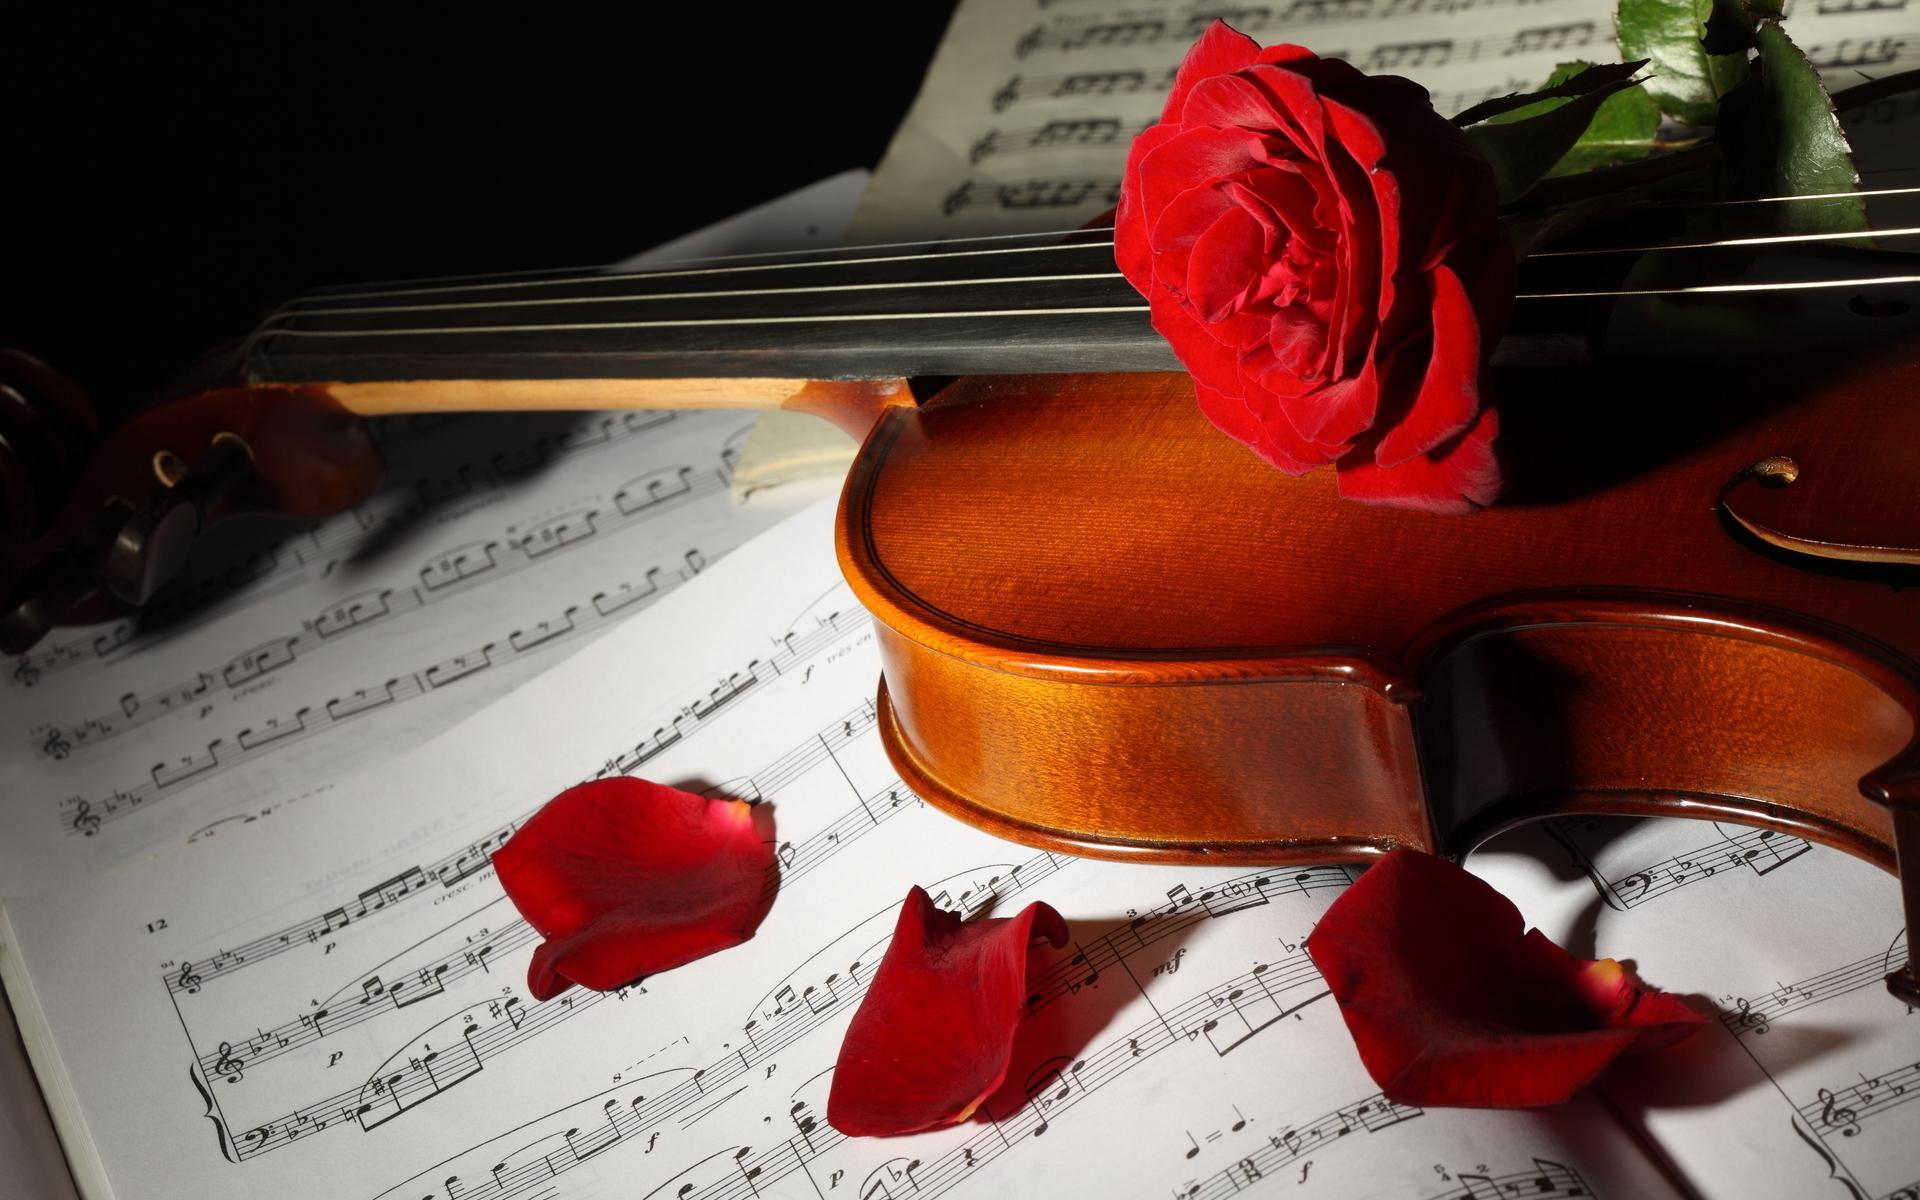 скрипка, ноты, торт  № 1908187 бесплатно